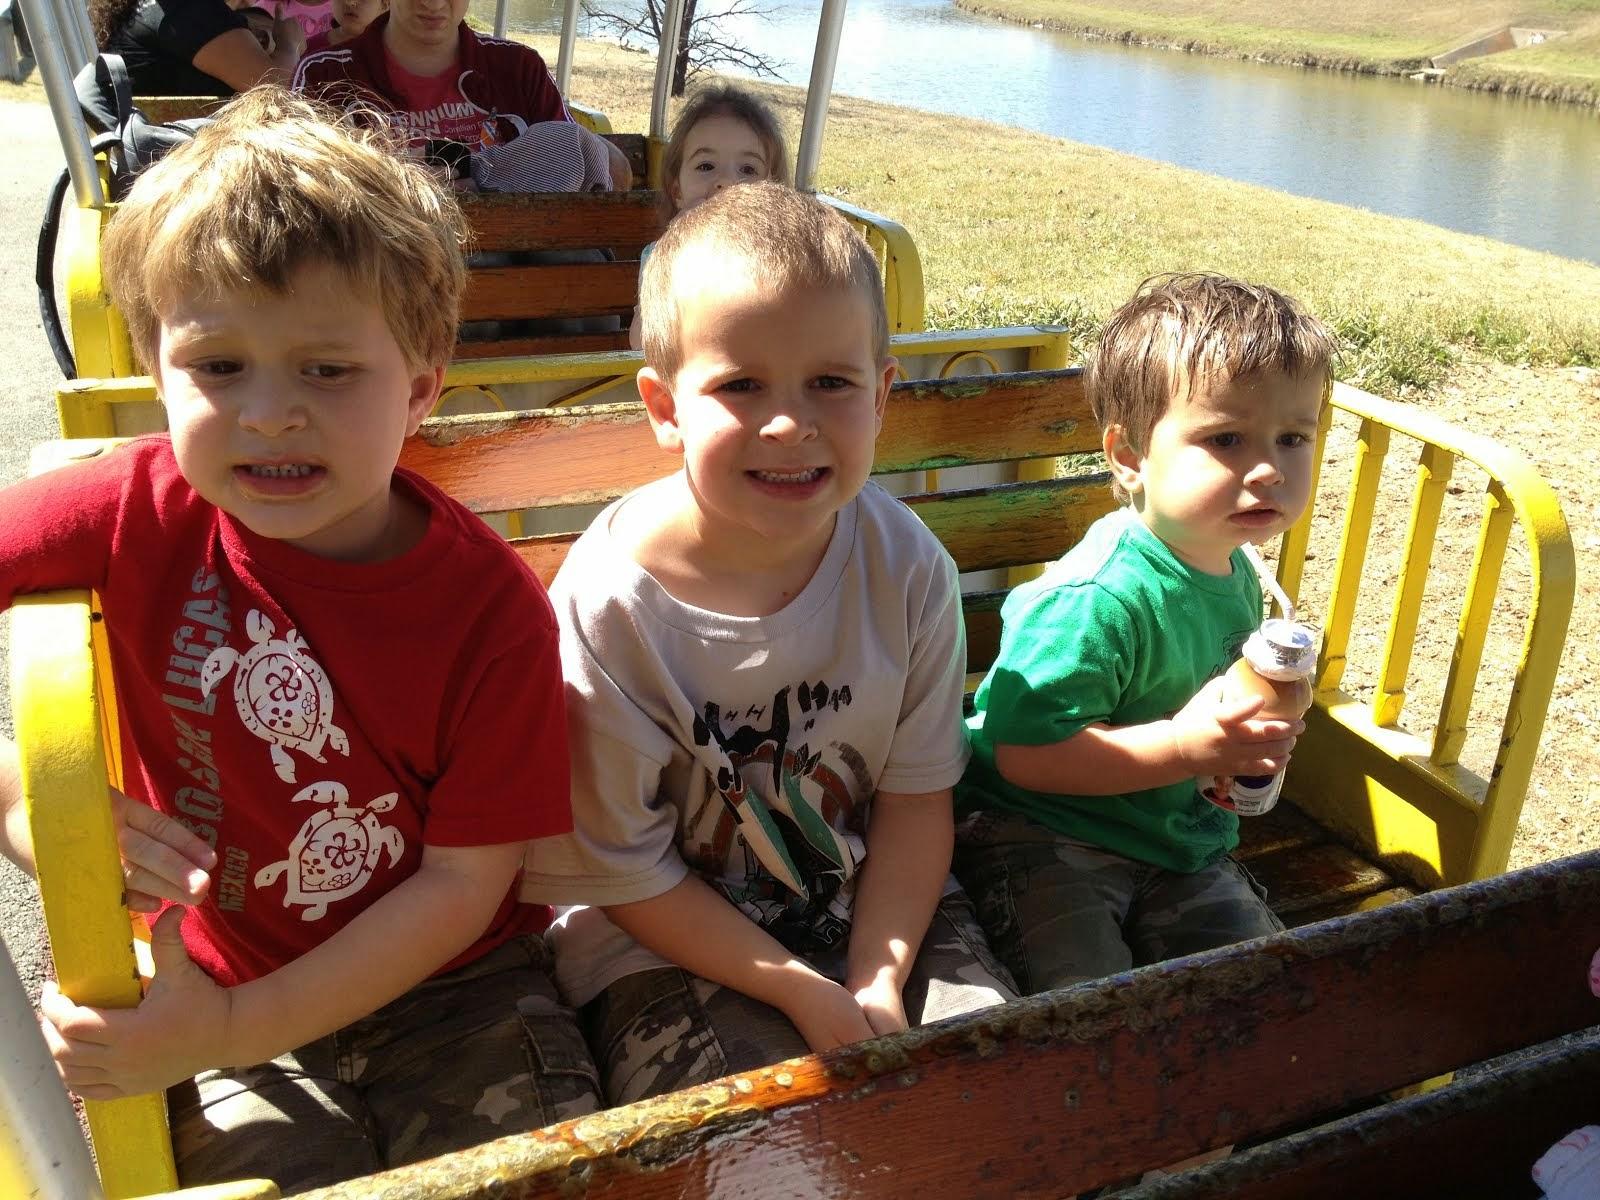 Weston 6, Caleb 4, Tyson 2